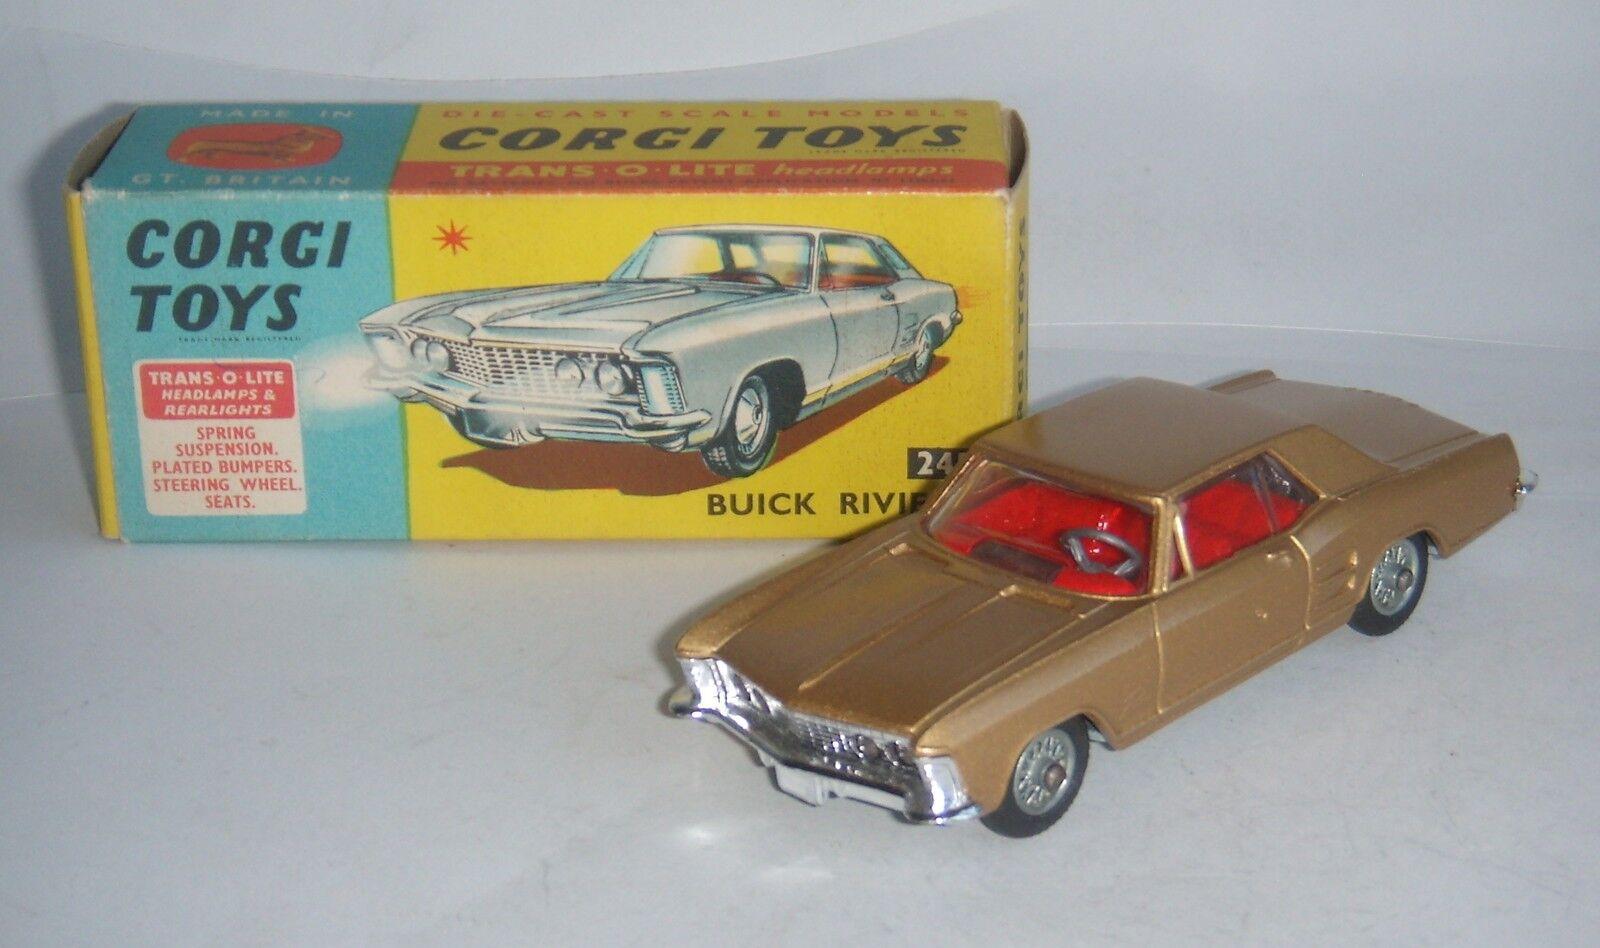 Corgi Toys Nº 245, Buick Riviera, - Excelente Casi Nuevo